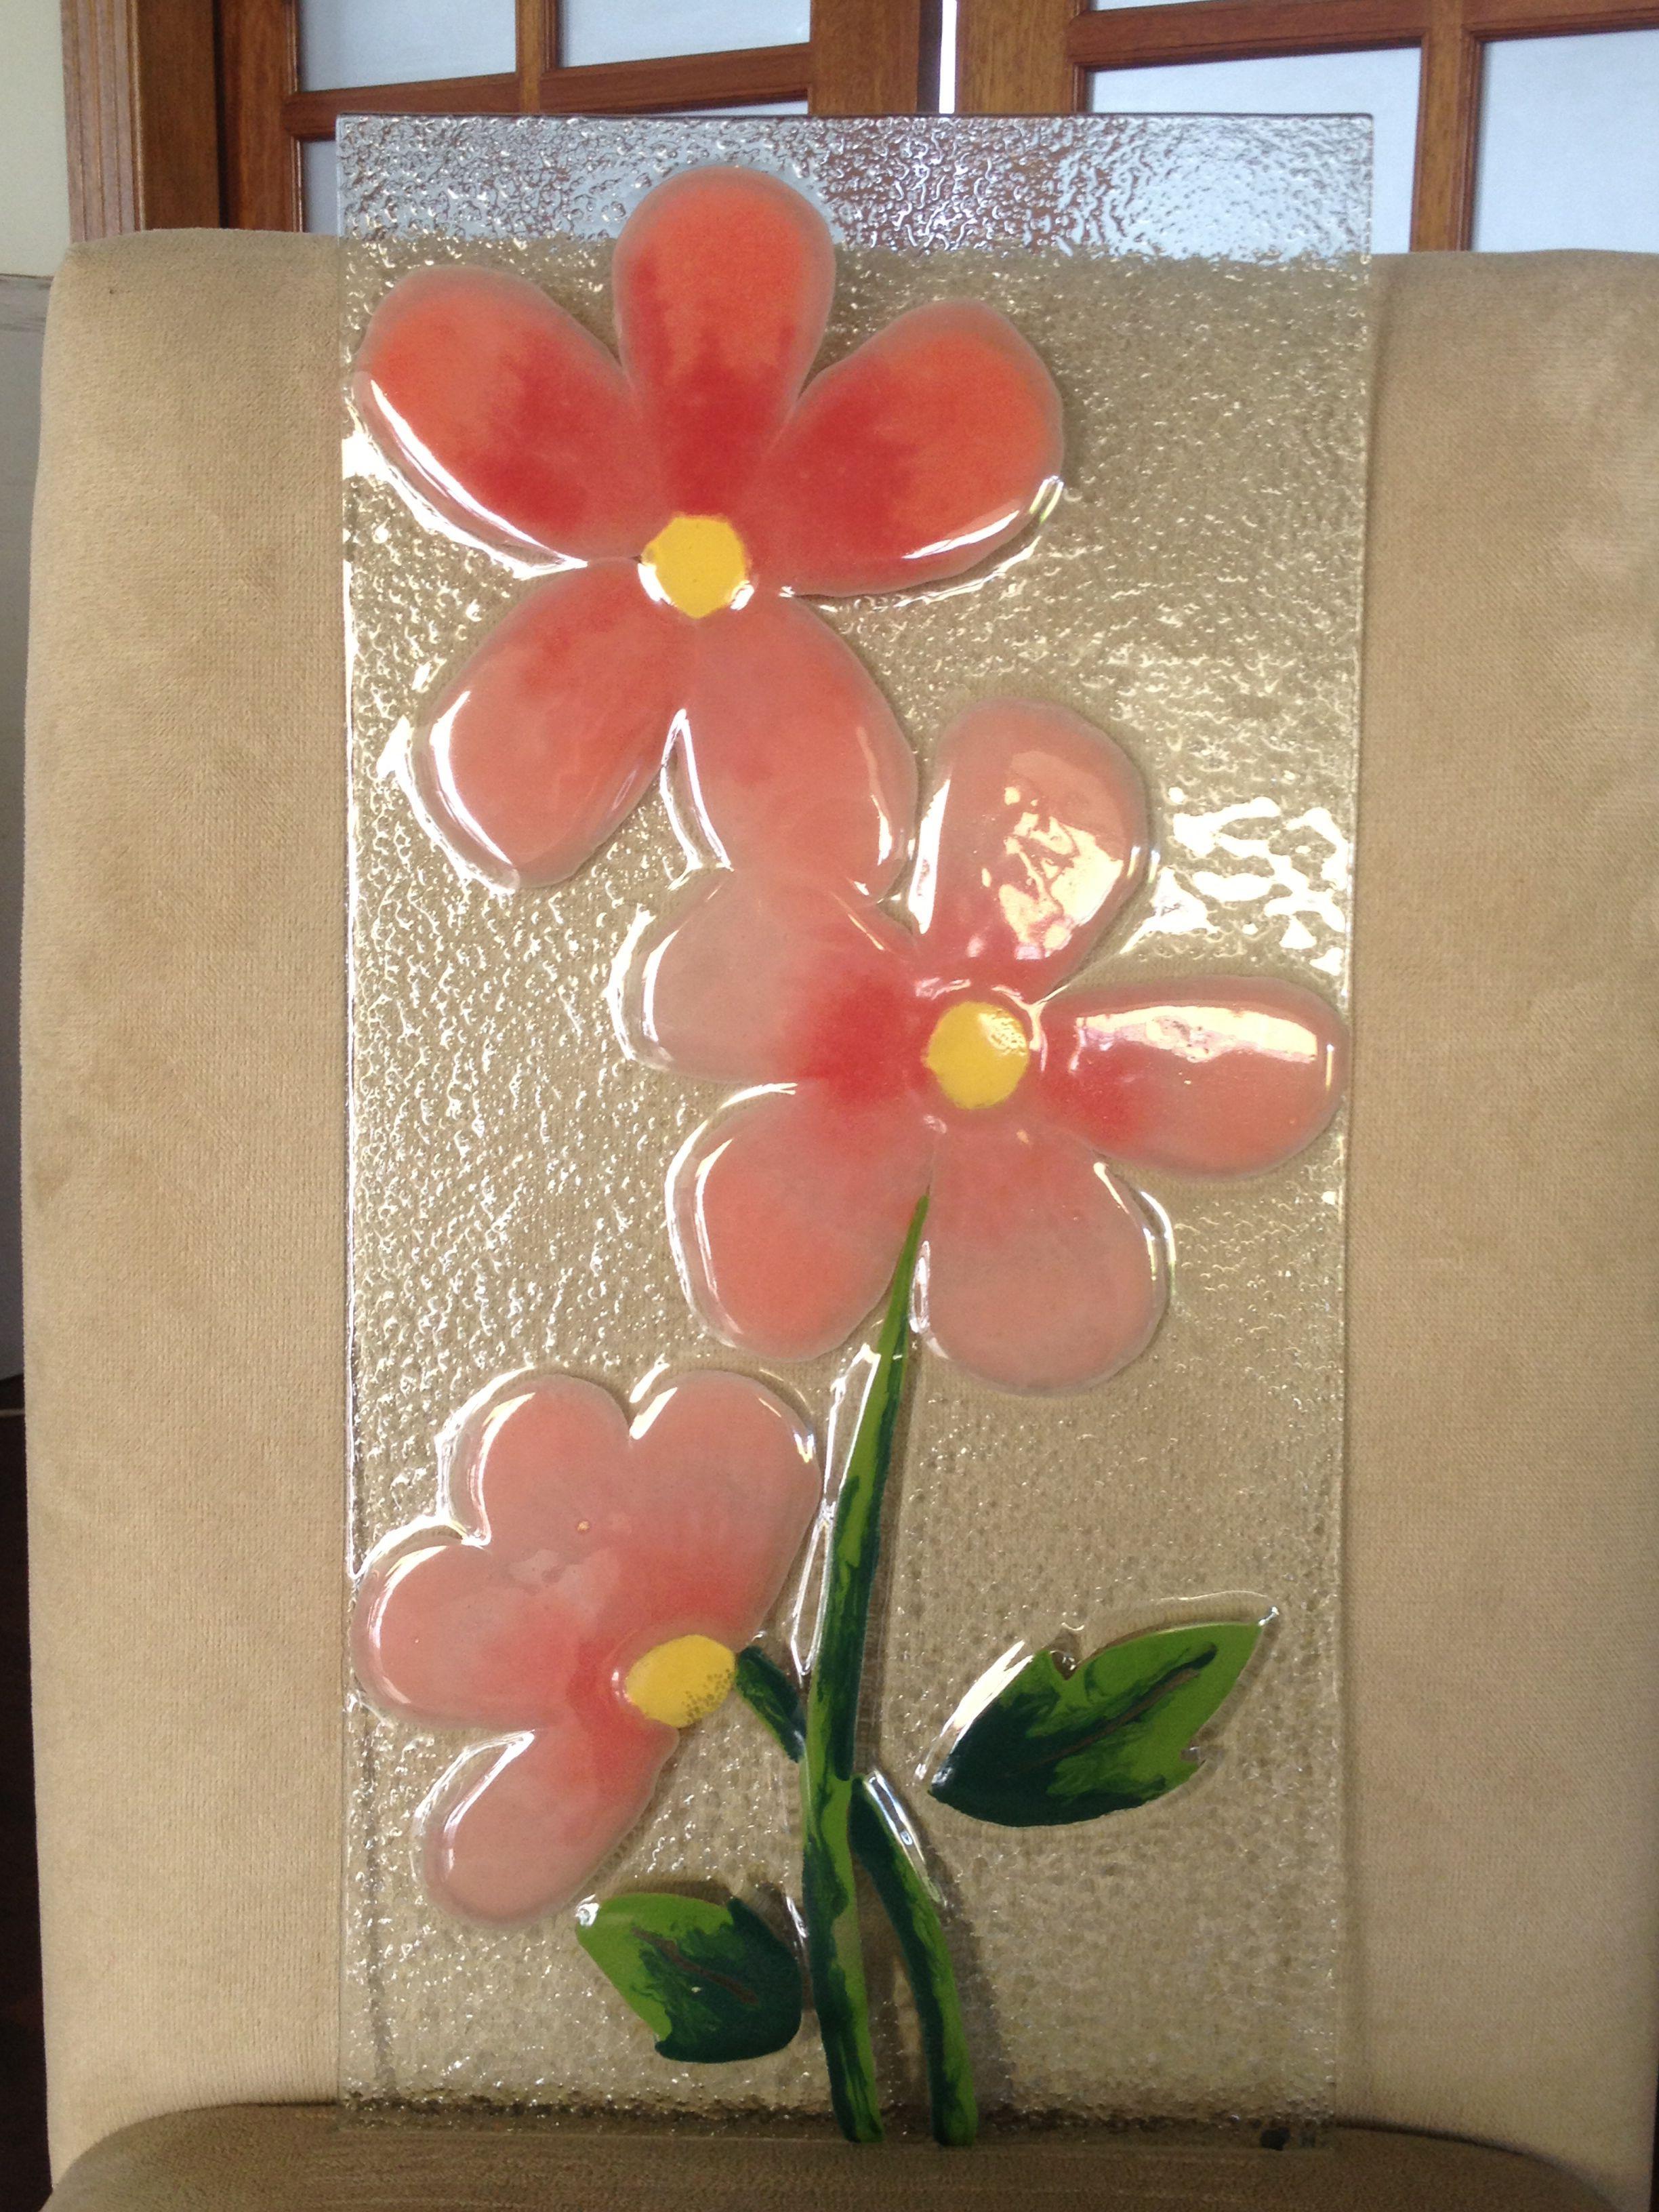 Cuadro flores ideas de vidrio pinterest cuadros - Vidrio plastico para cuadros ...